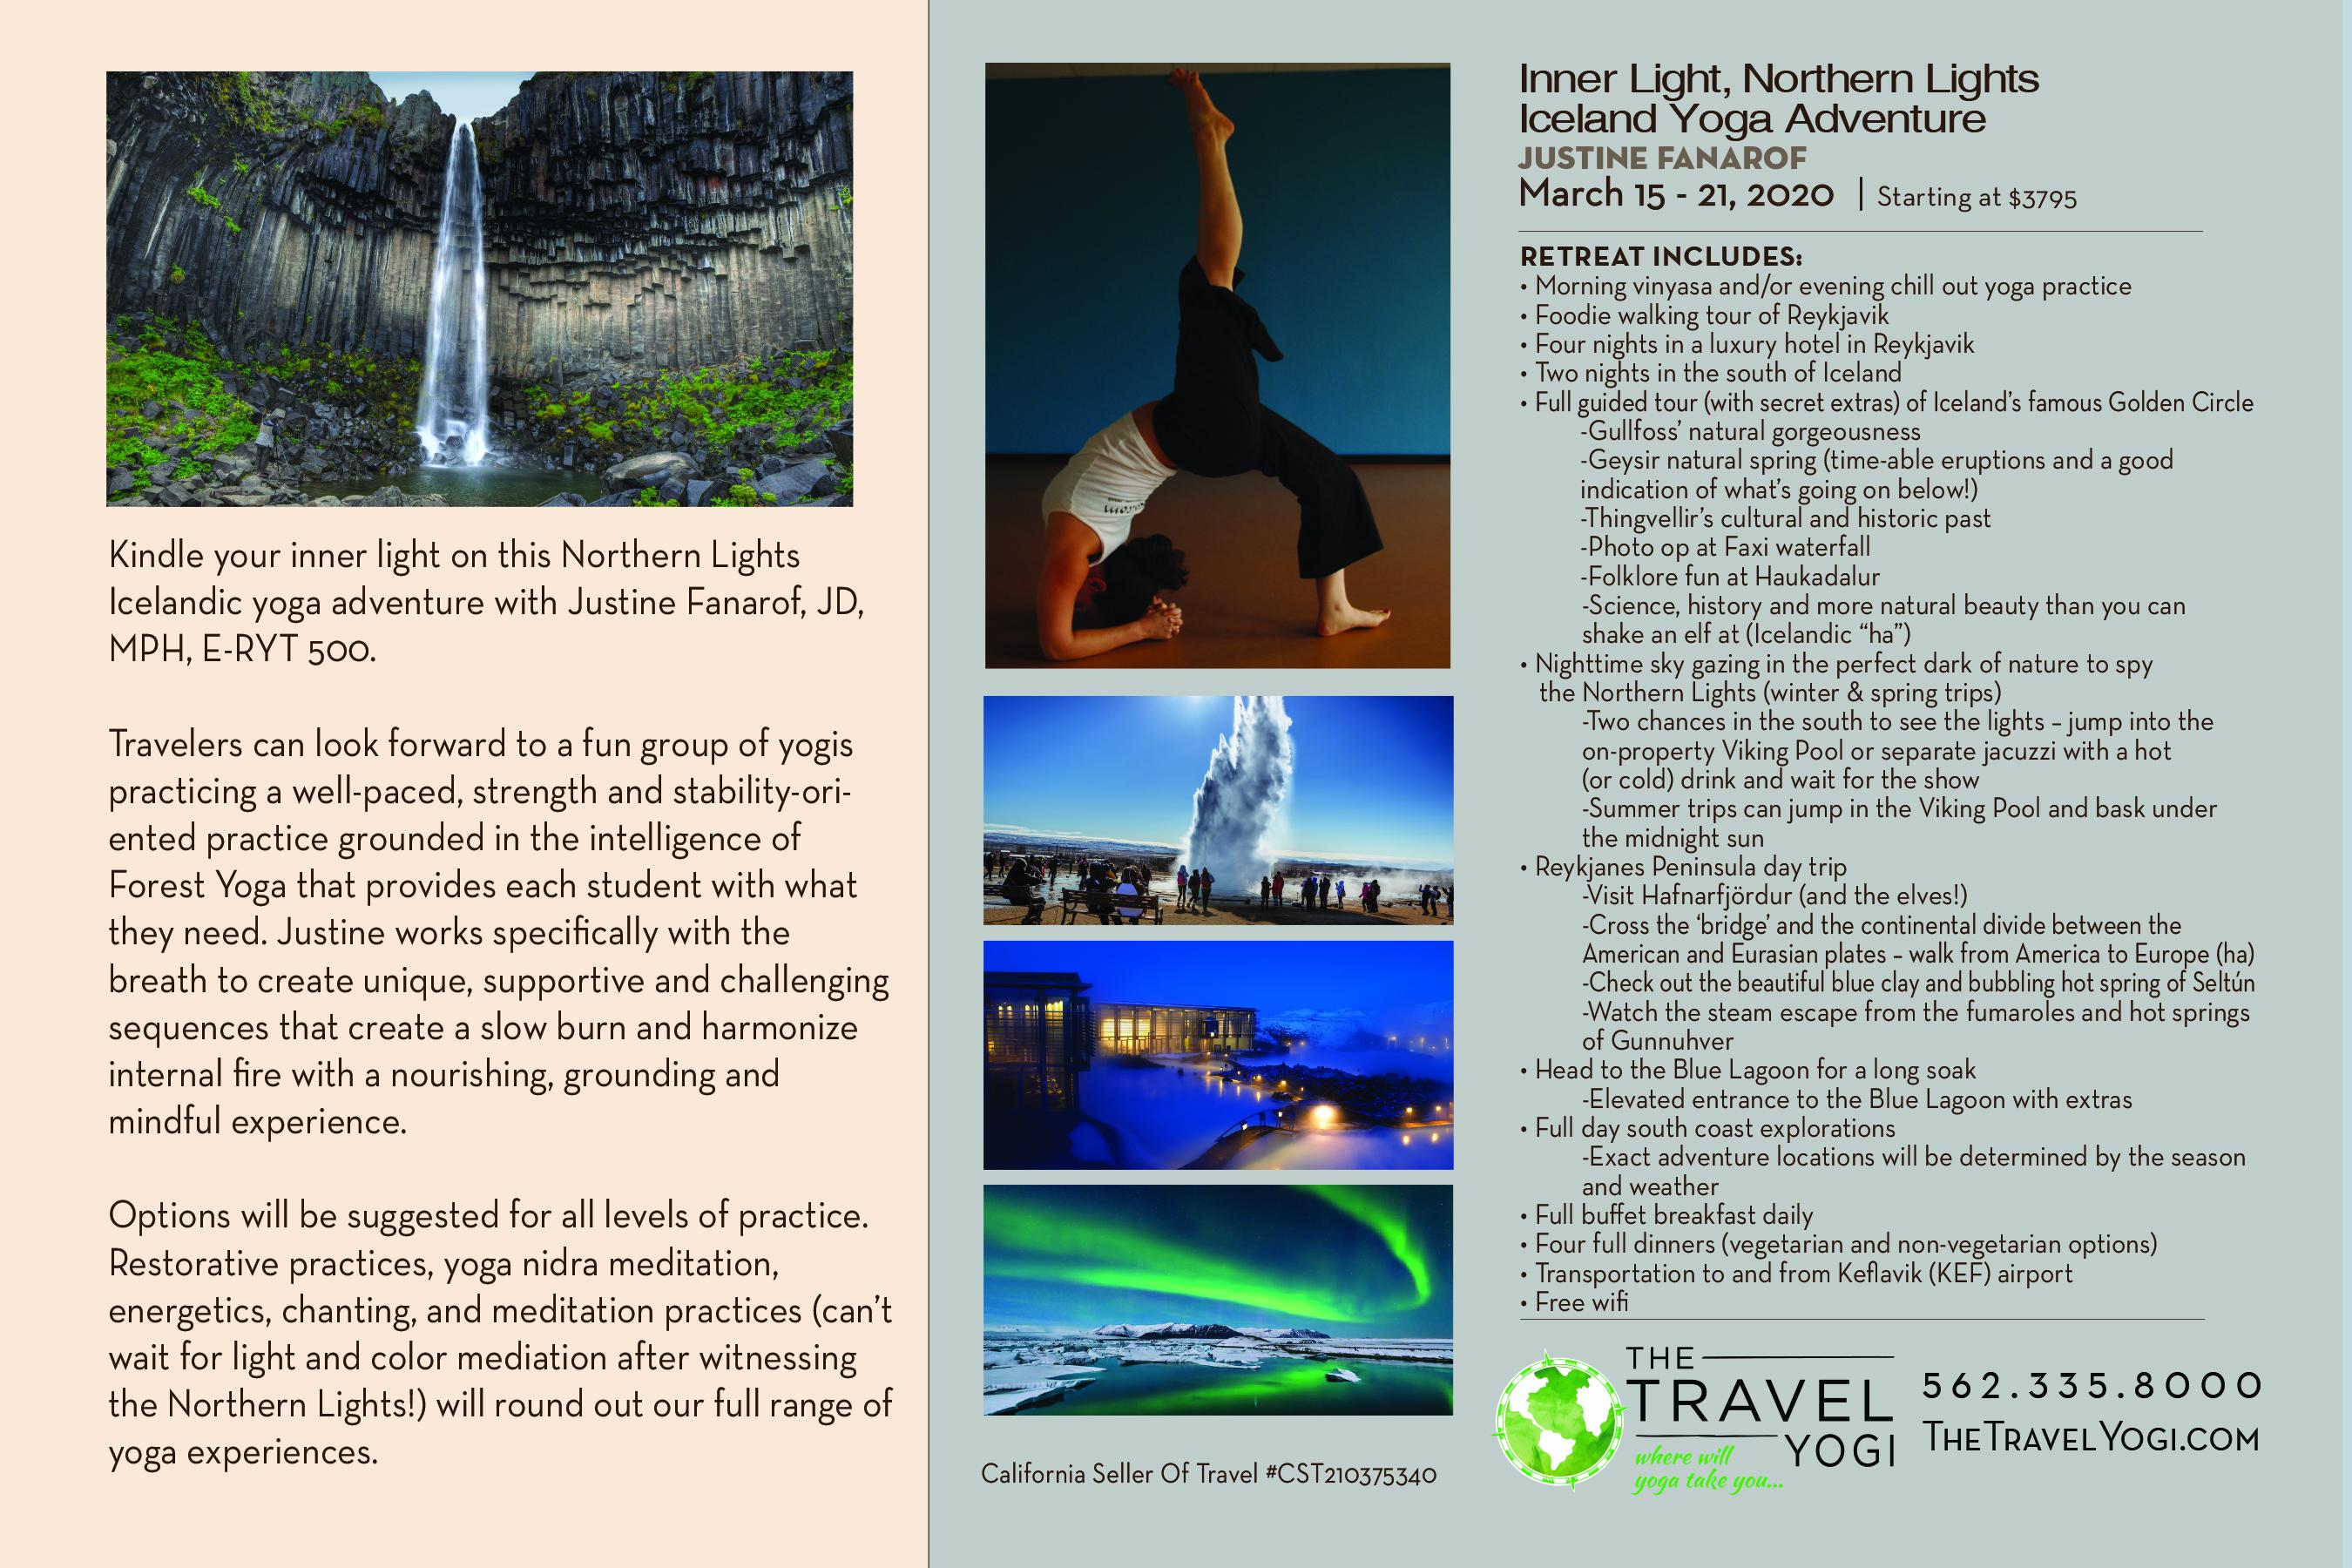 Iceland Yoga Justine Fanarof Retreat Adventure Northern Lights Travel Yogi Spring Break 2020